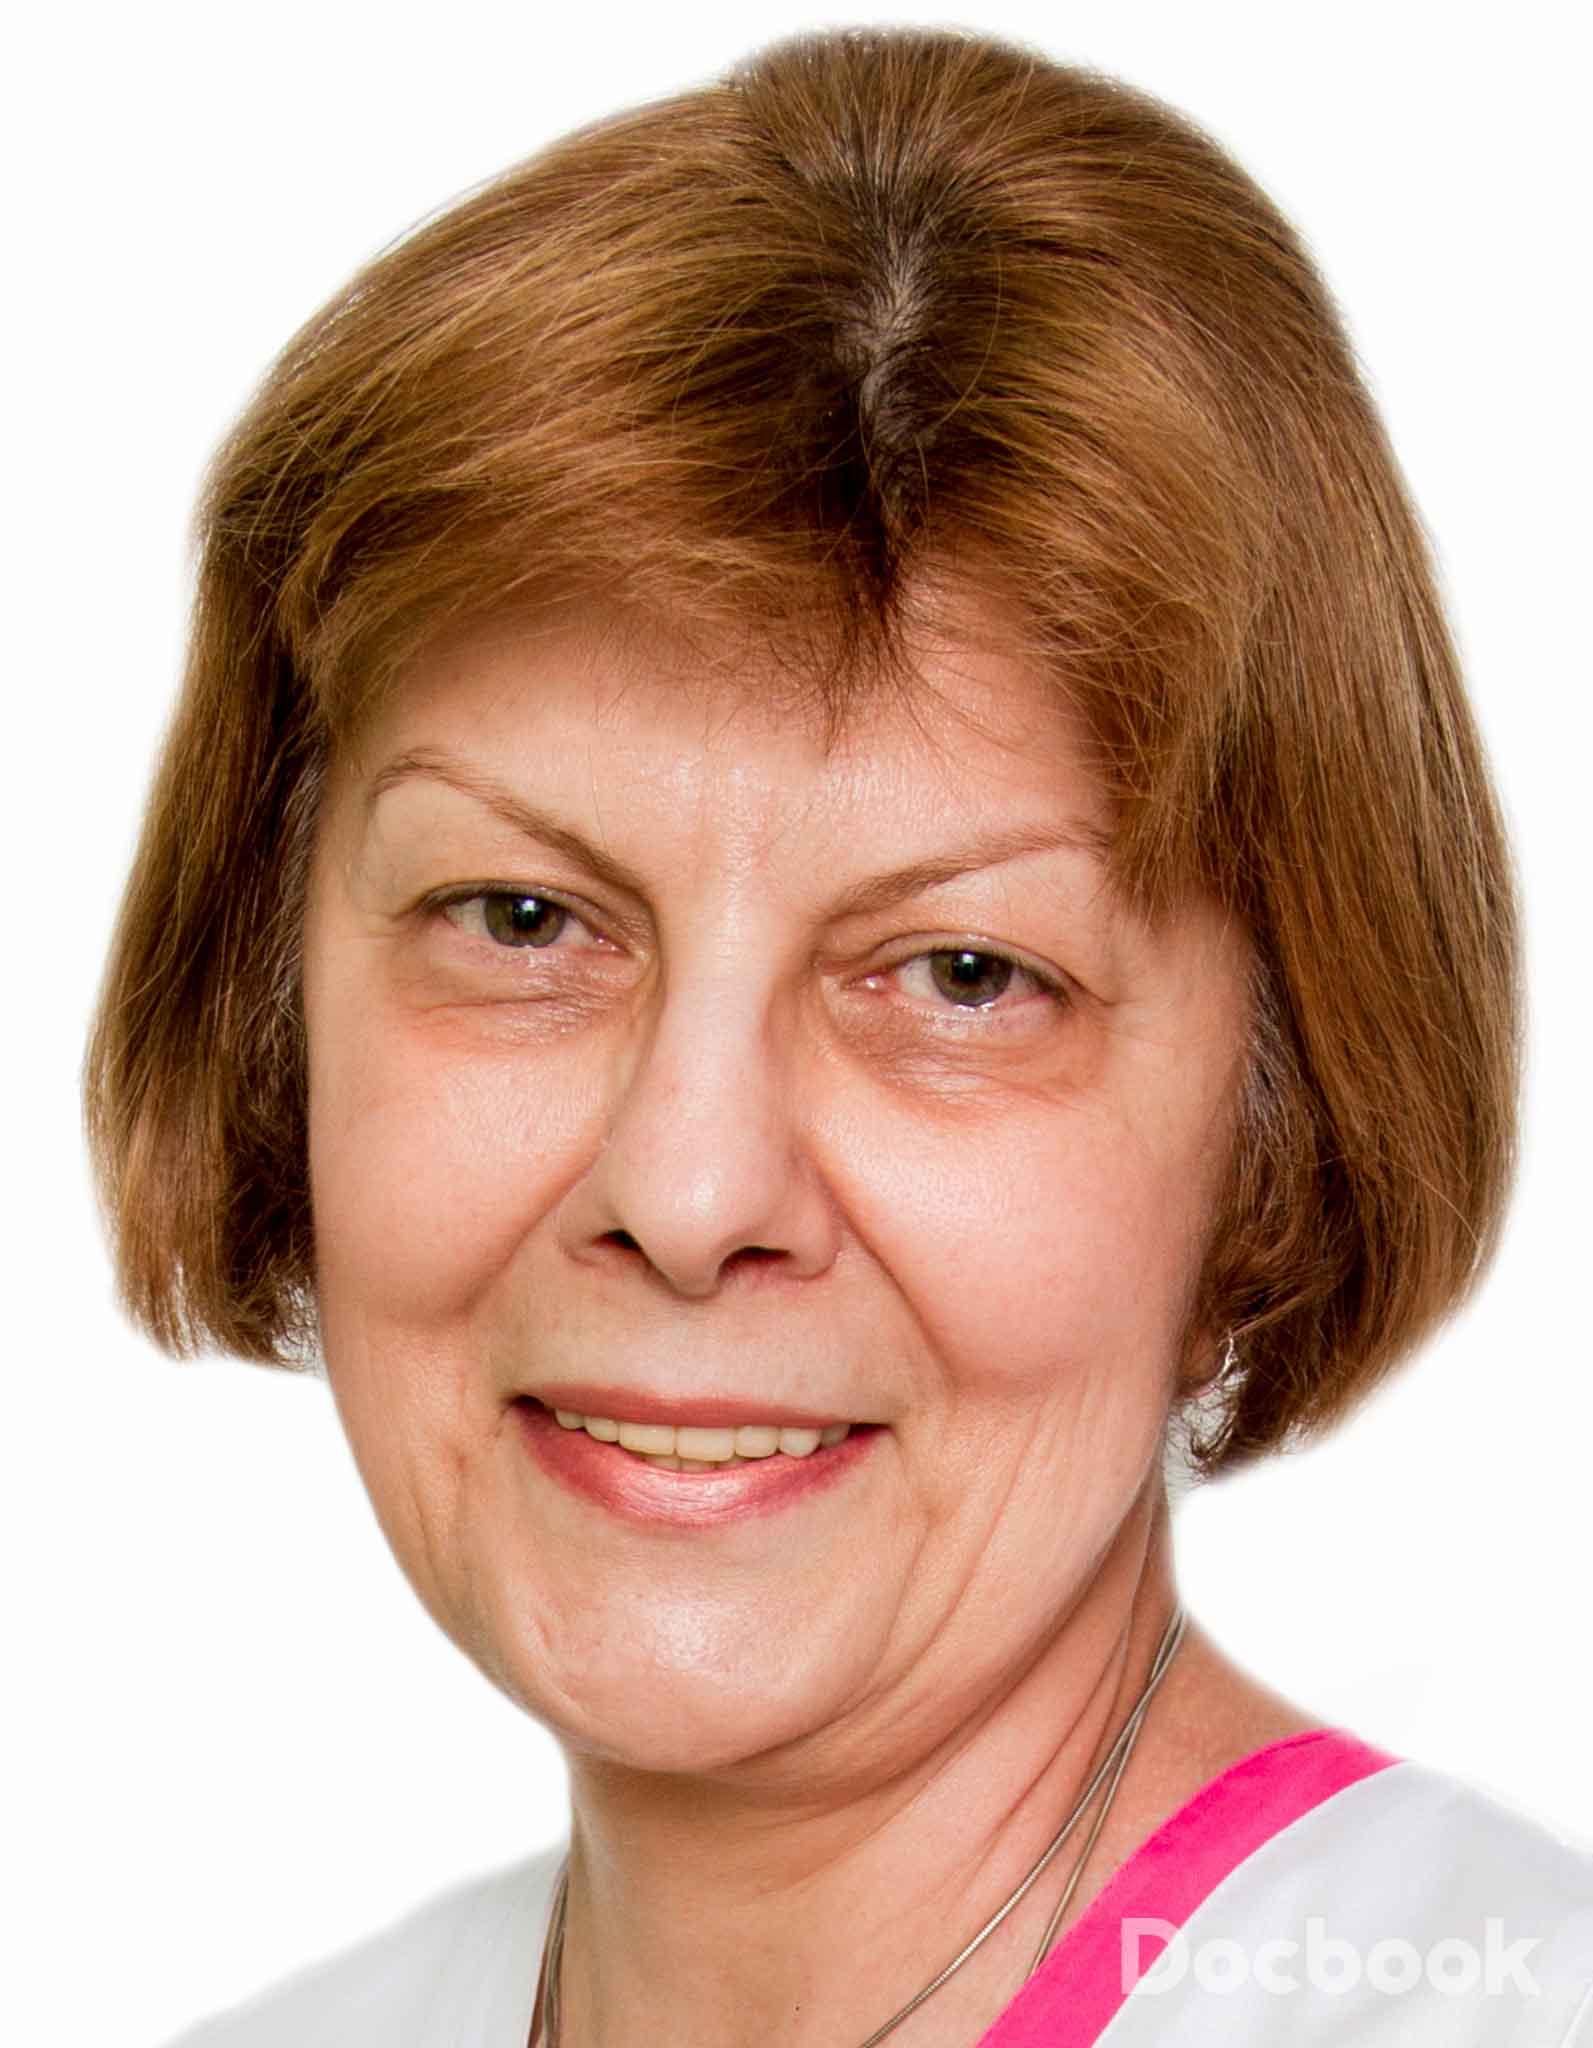 Dr. Adina Emilia Croitoru